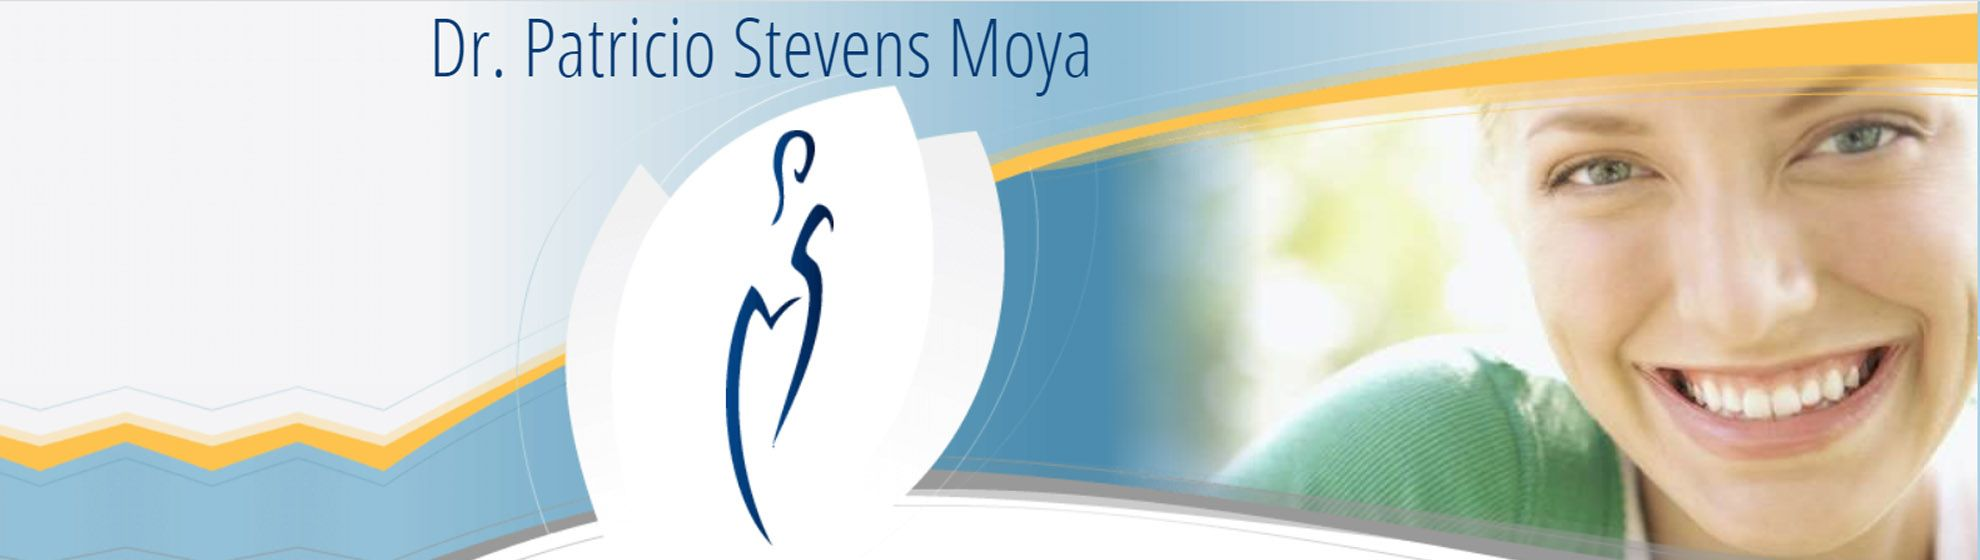 Doctor Patricio Stevens Moya